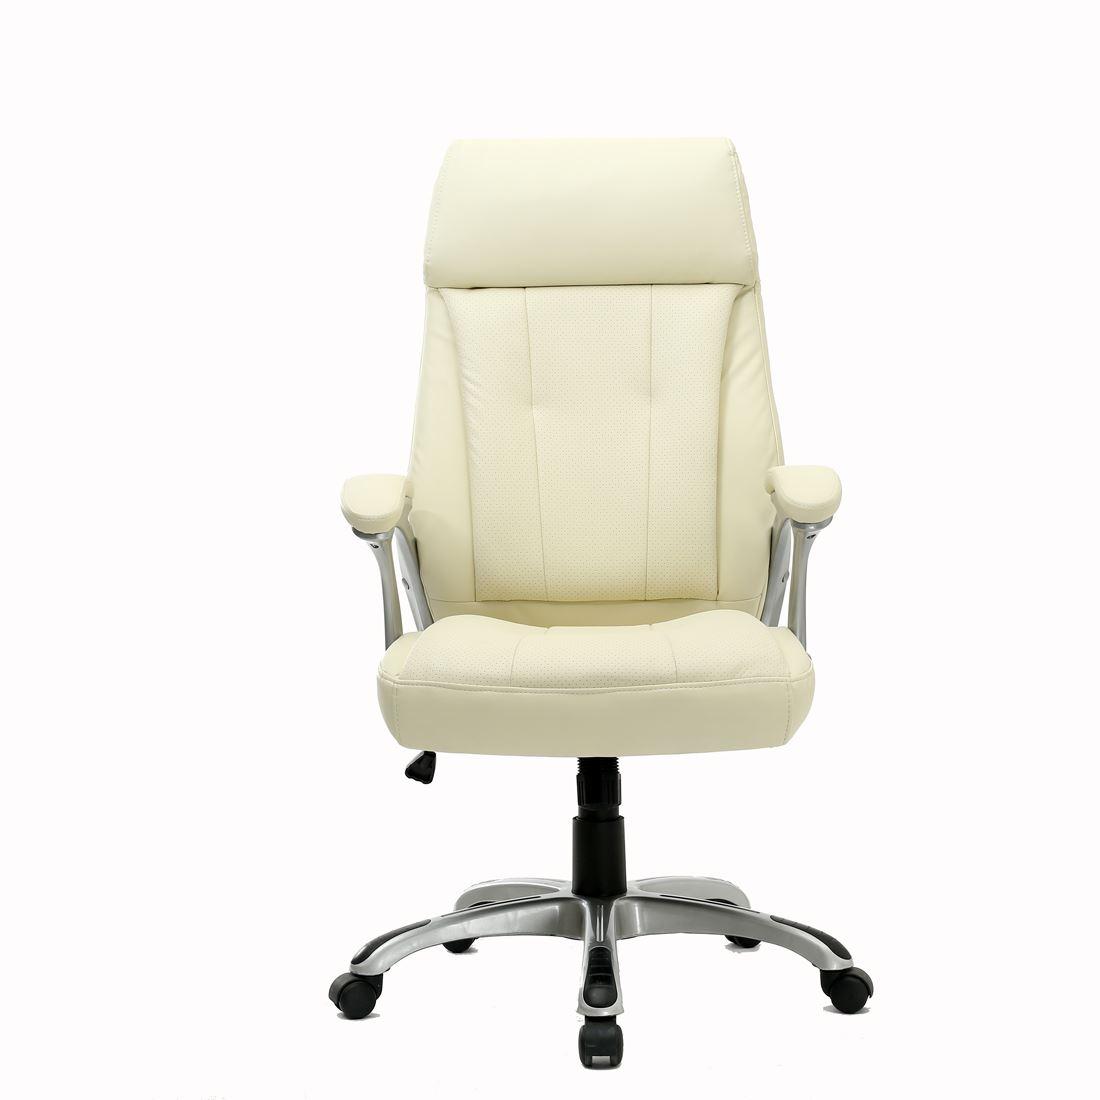 desk chair ebay uk high target au modini back executive office leather computer